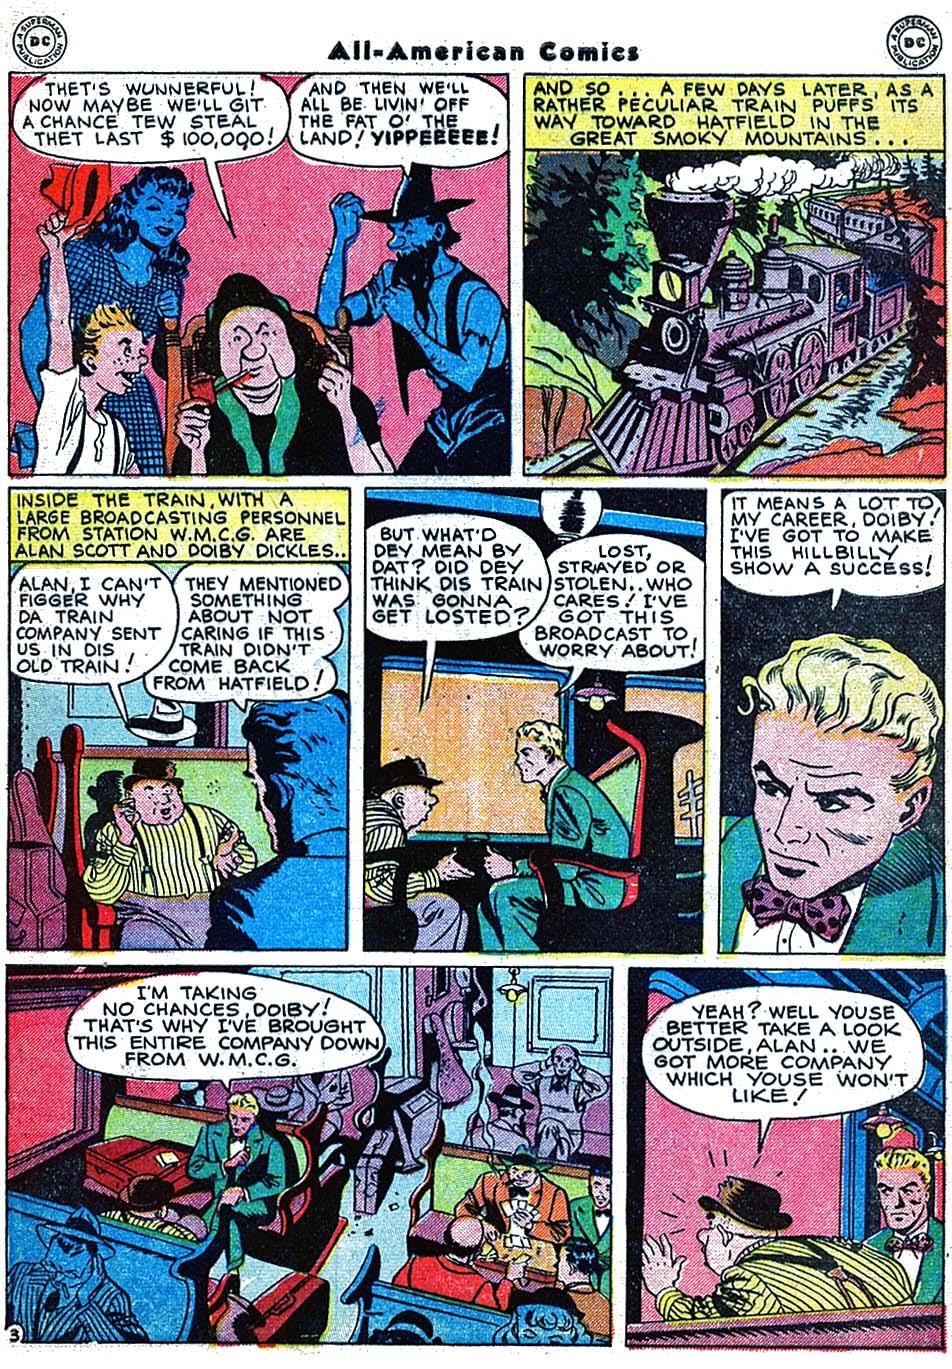 Read online All-American Comics (1939) comic -  Issue #73 - 5